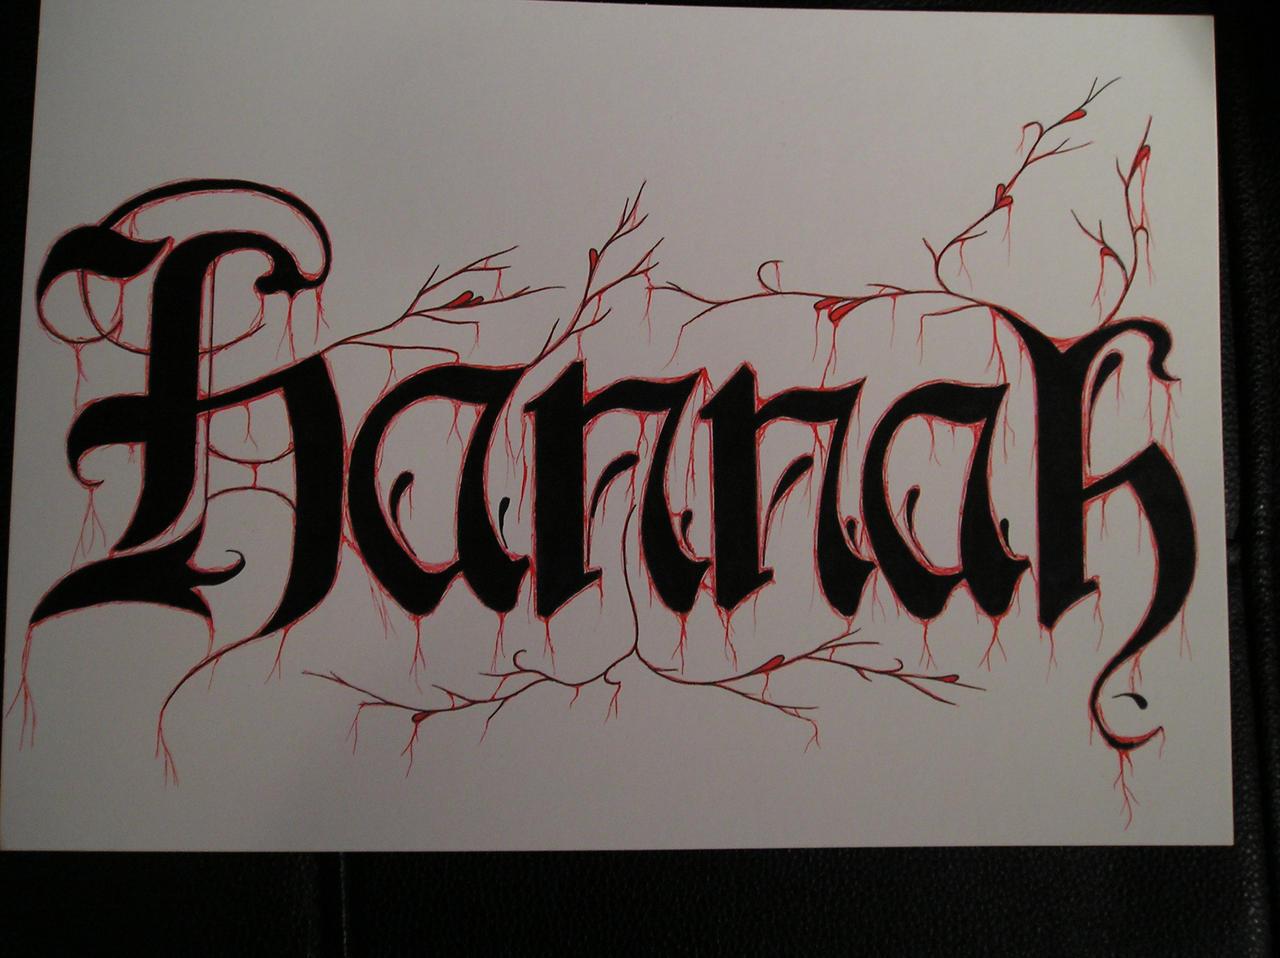 Name Drawings: Hannah Drawing By Virusoverload On DeviantArt